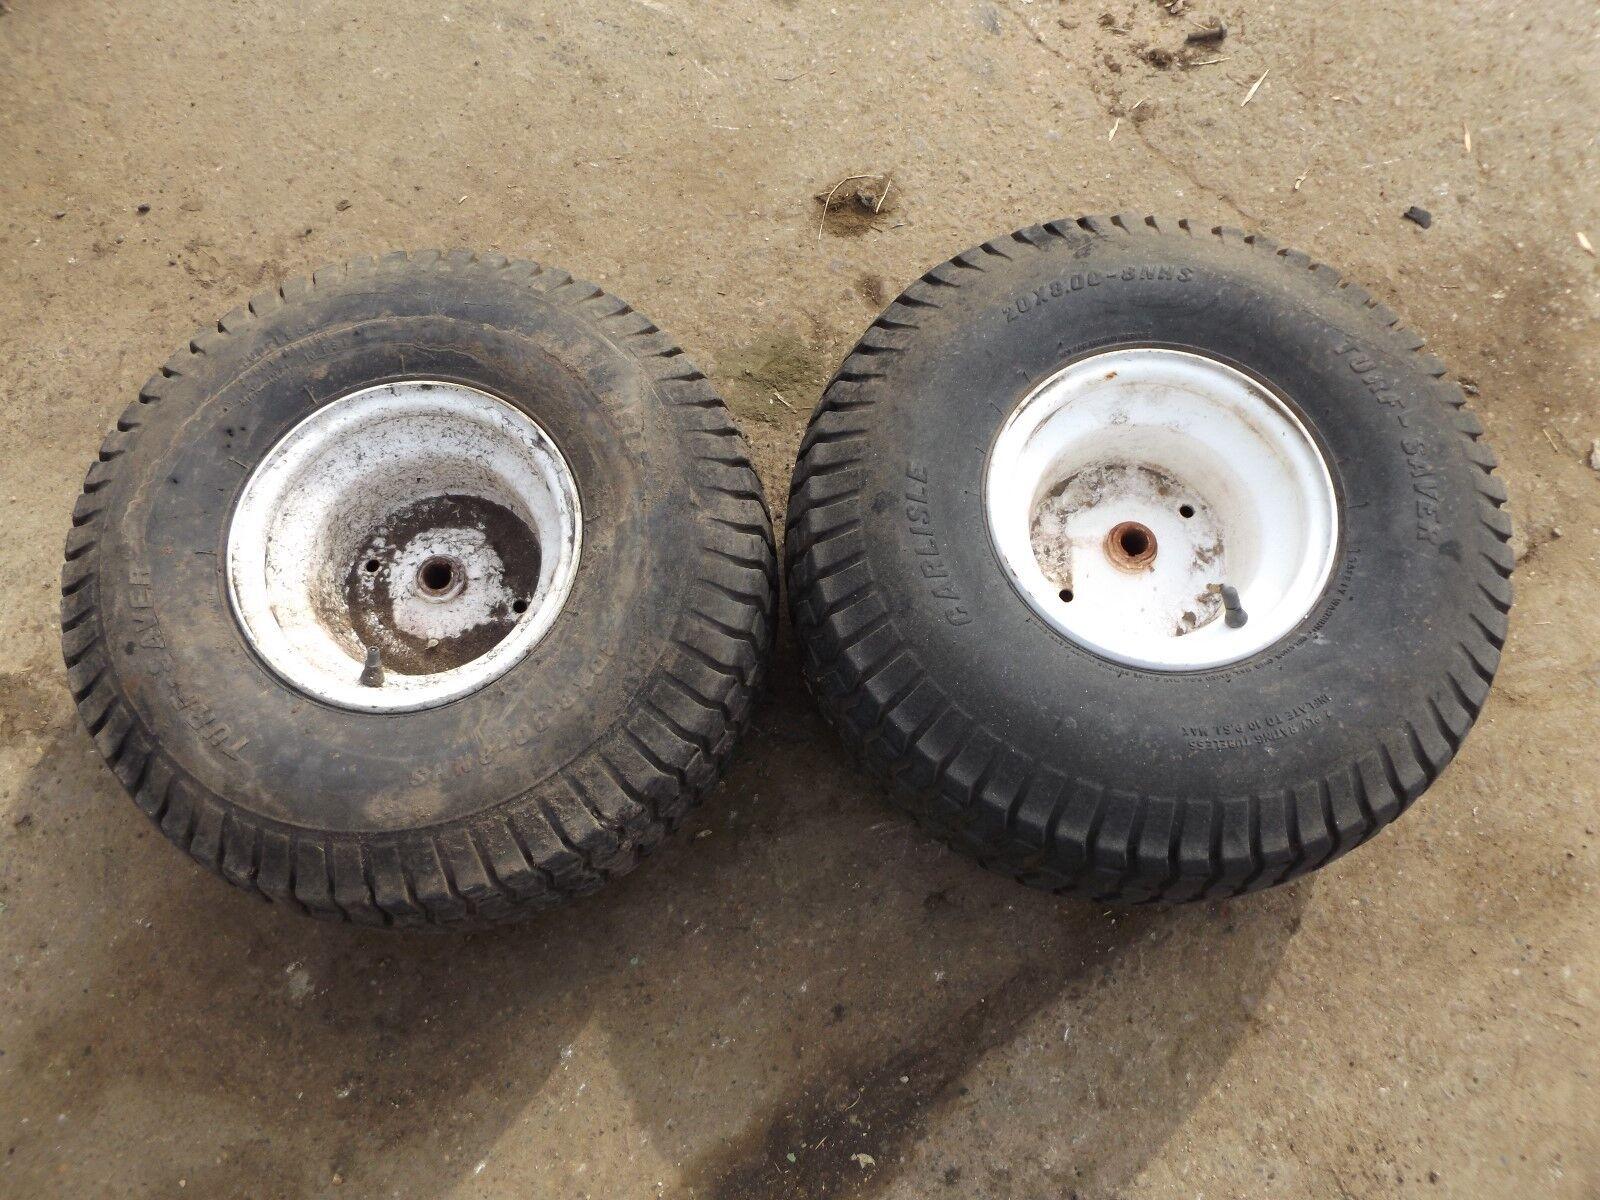 Craftsman LT2000 Rear Rims and Tires 20x8.00-8